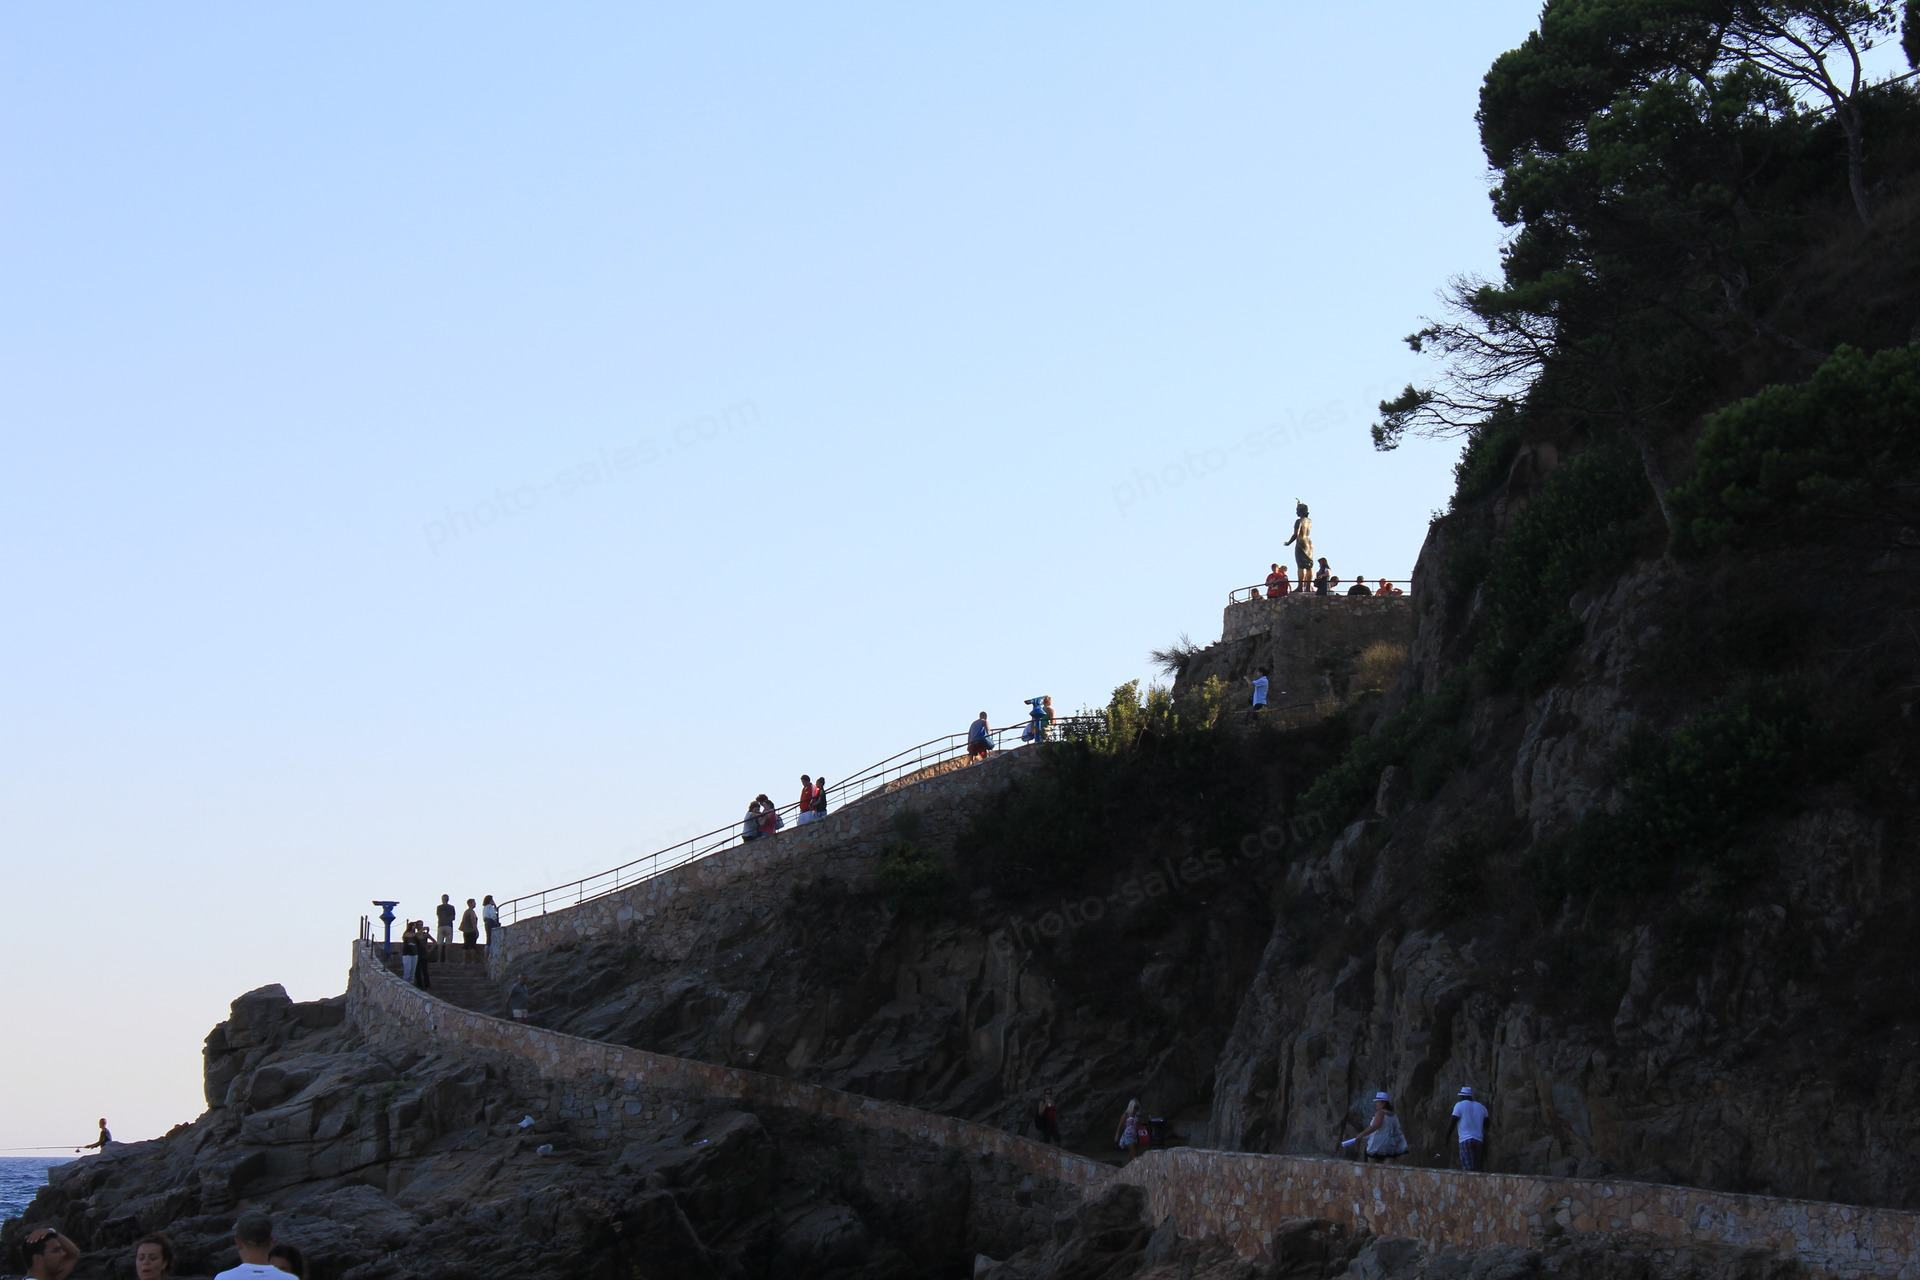 Lloret ڈی مارچ میں سیڑھیوں اور مجسمہ